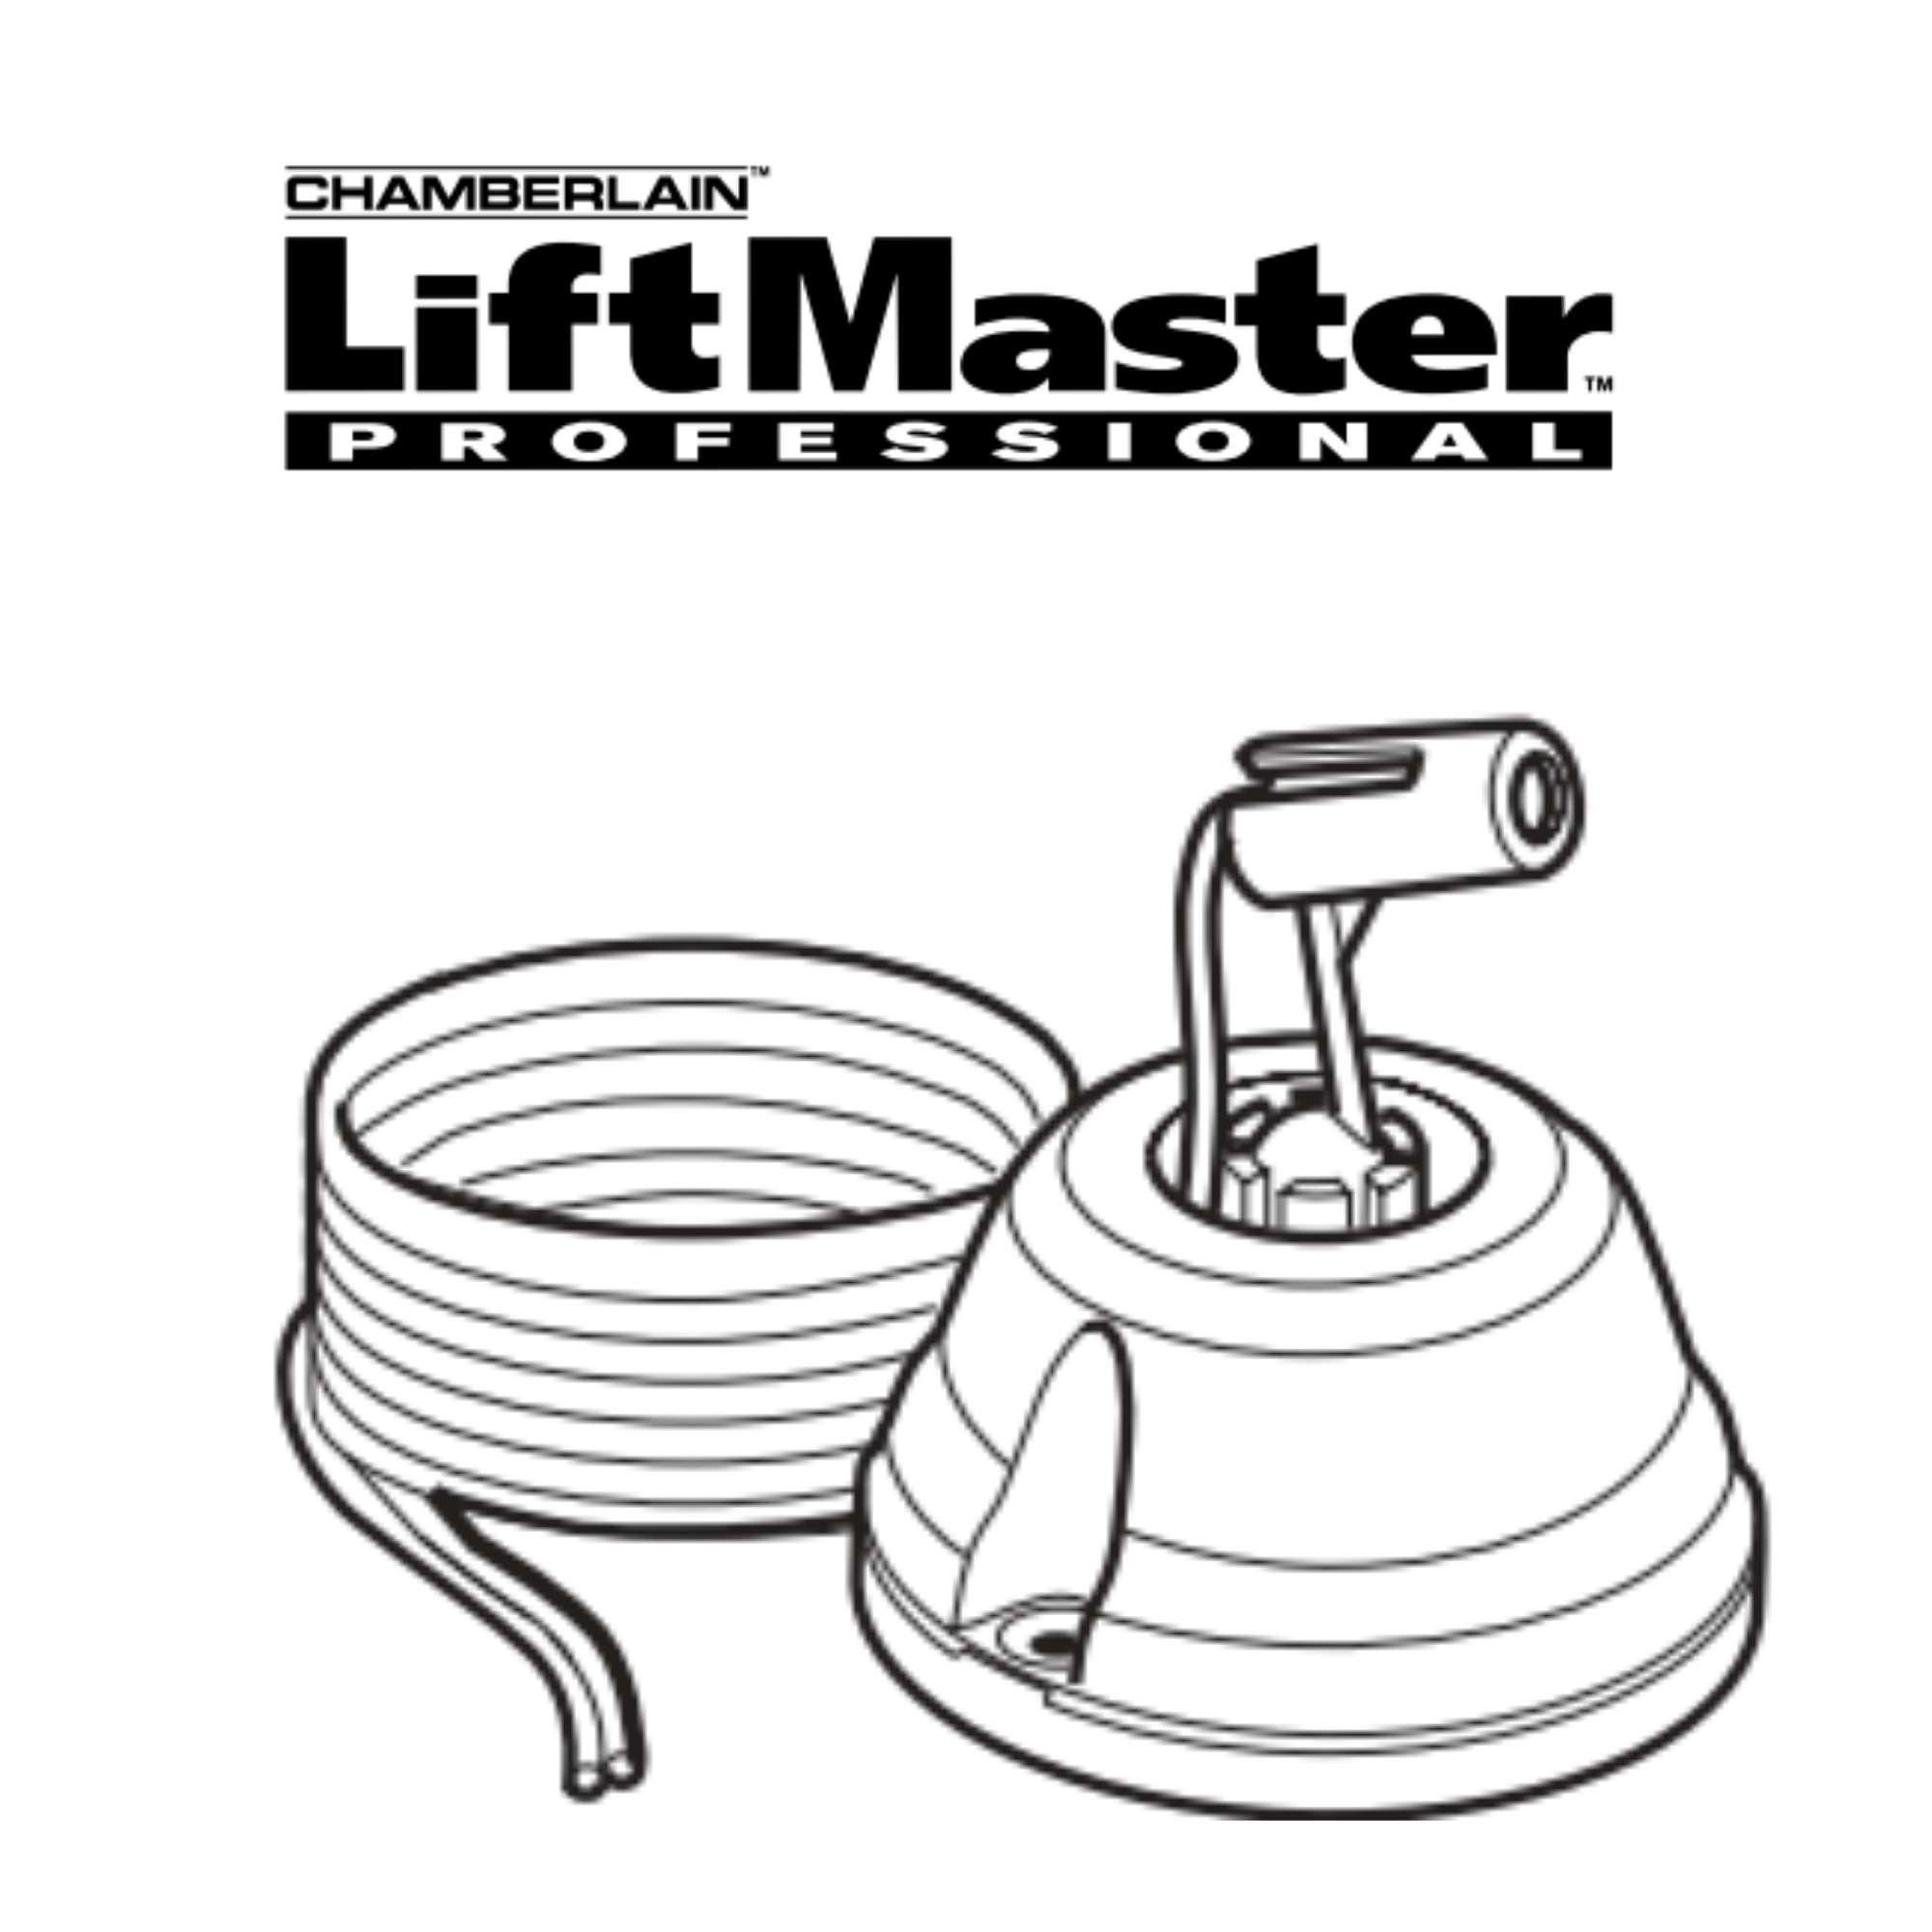 Liftmaster Laser Garage Parking Assistant – Model 975LM and 976LMC